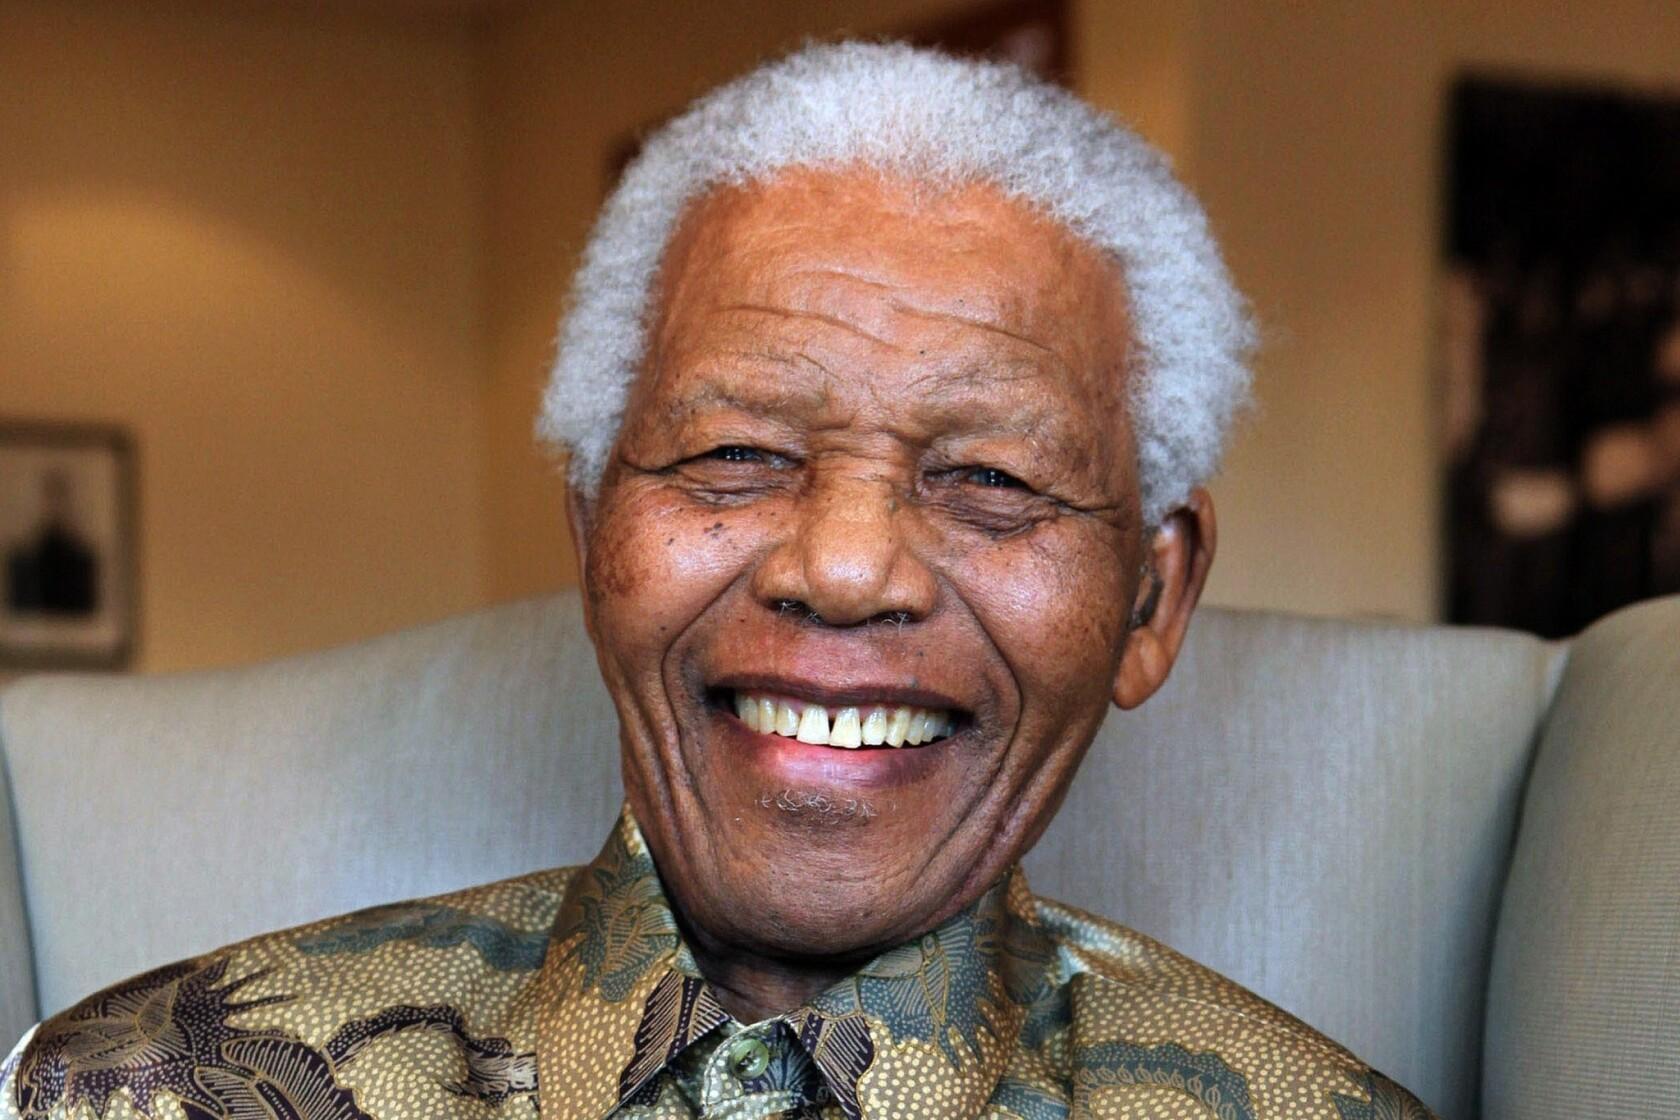 Nelson Mandelas Unforgettable Face Spirit Captivate Film